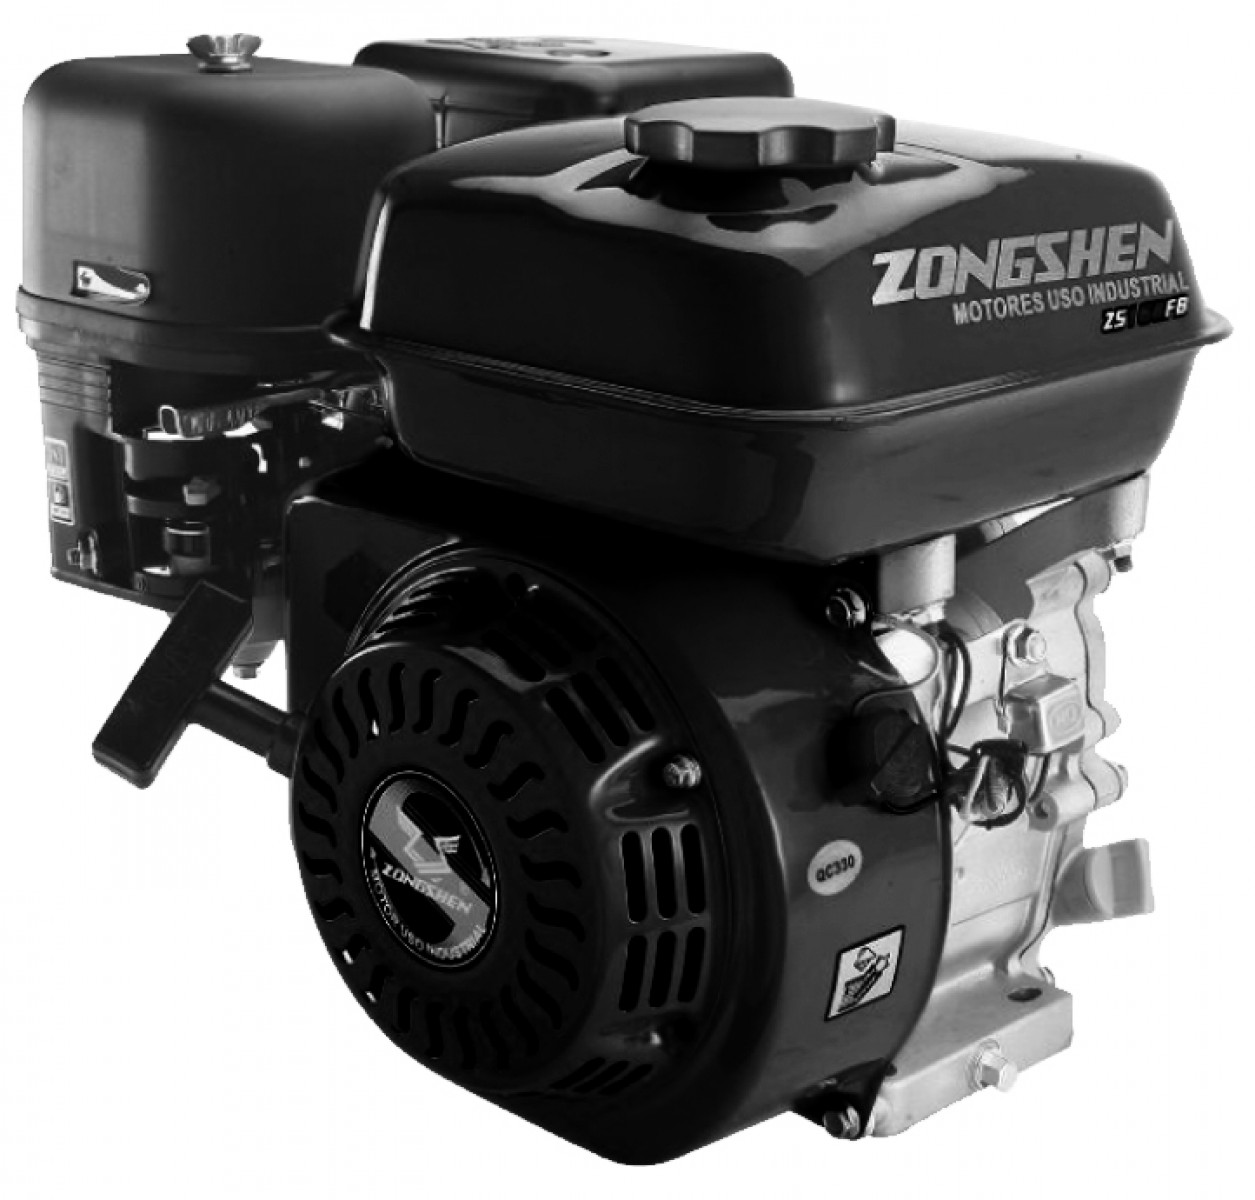 Motor ZONGSHEN 168FB 196cc 6,5 HŘÍDEL 20mm